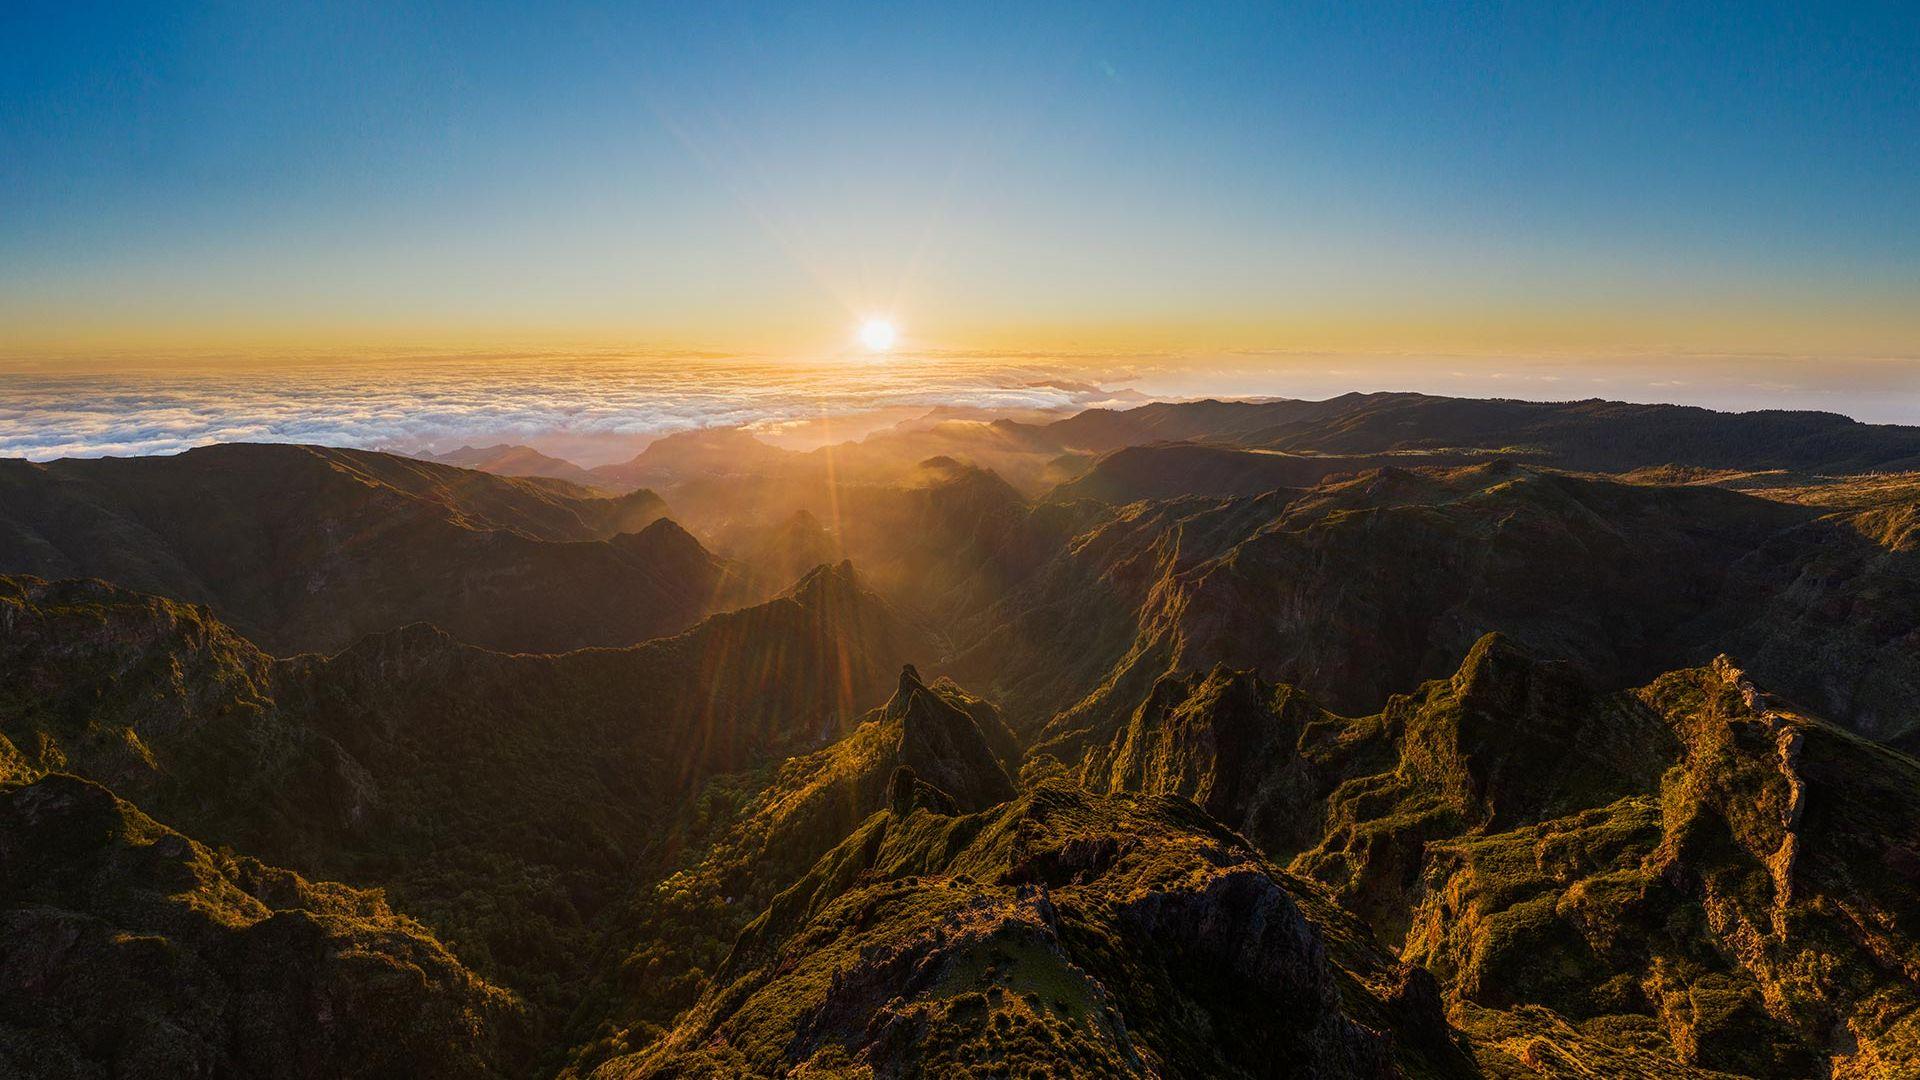 Sejur plaja Savoy Signature Madeira, 8 zile - 18 septembrie 2021